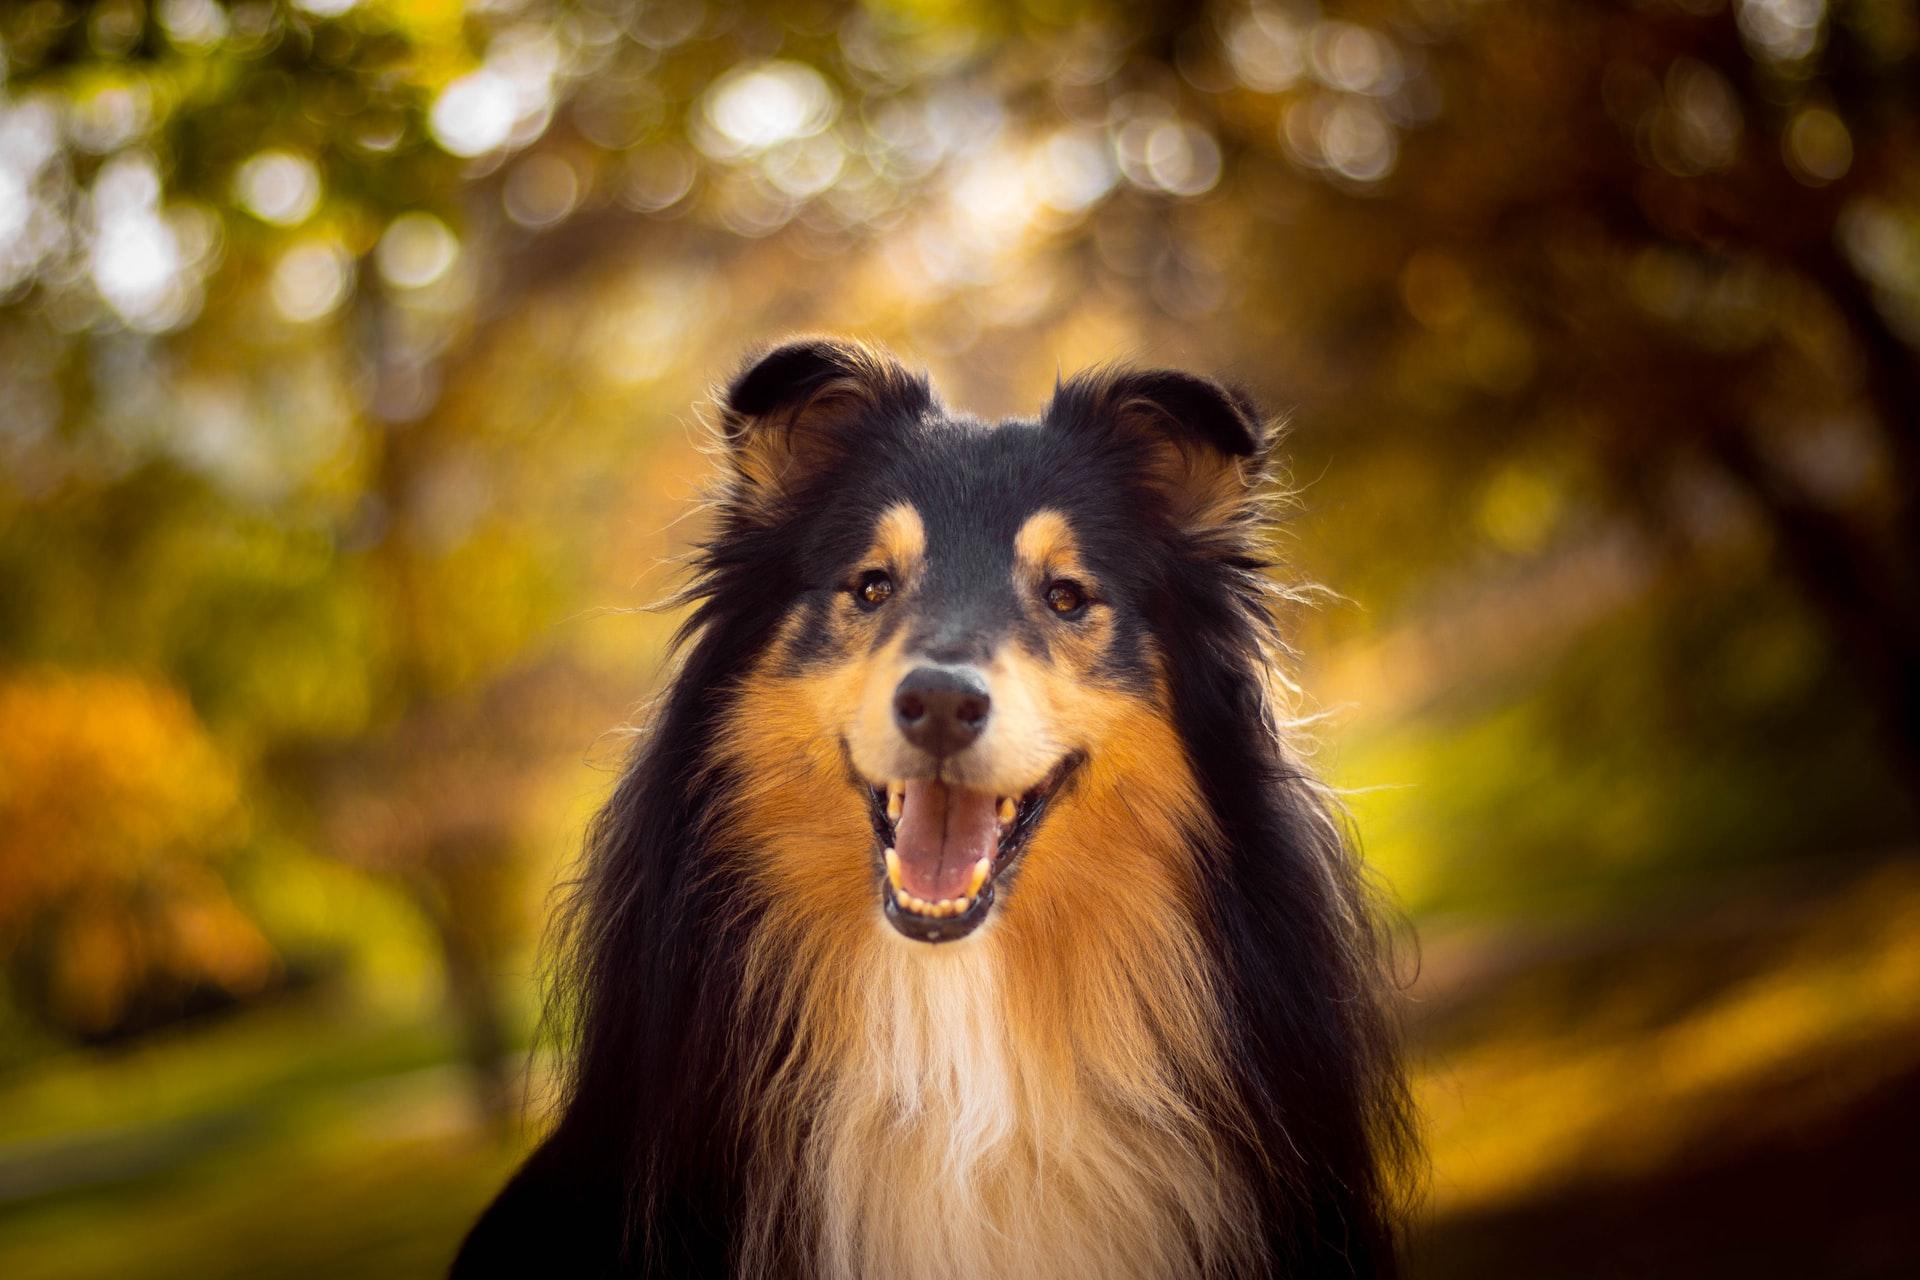 The Collie Medium Sized Dog Breed